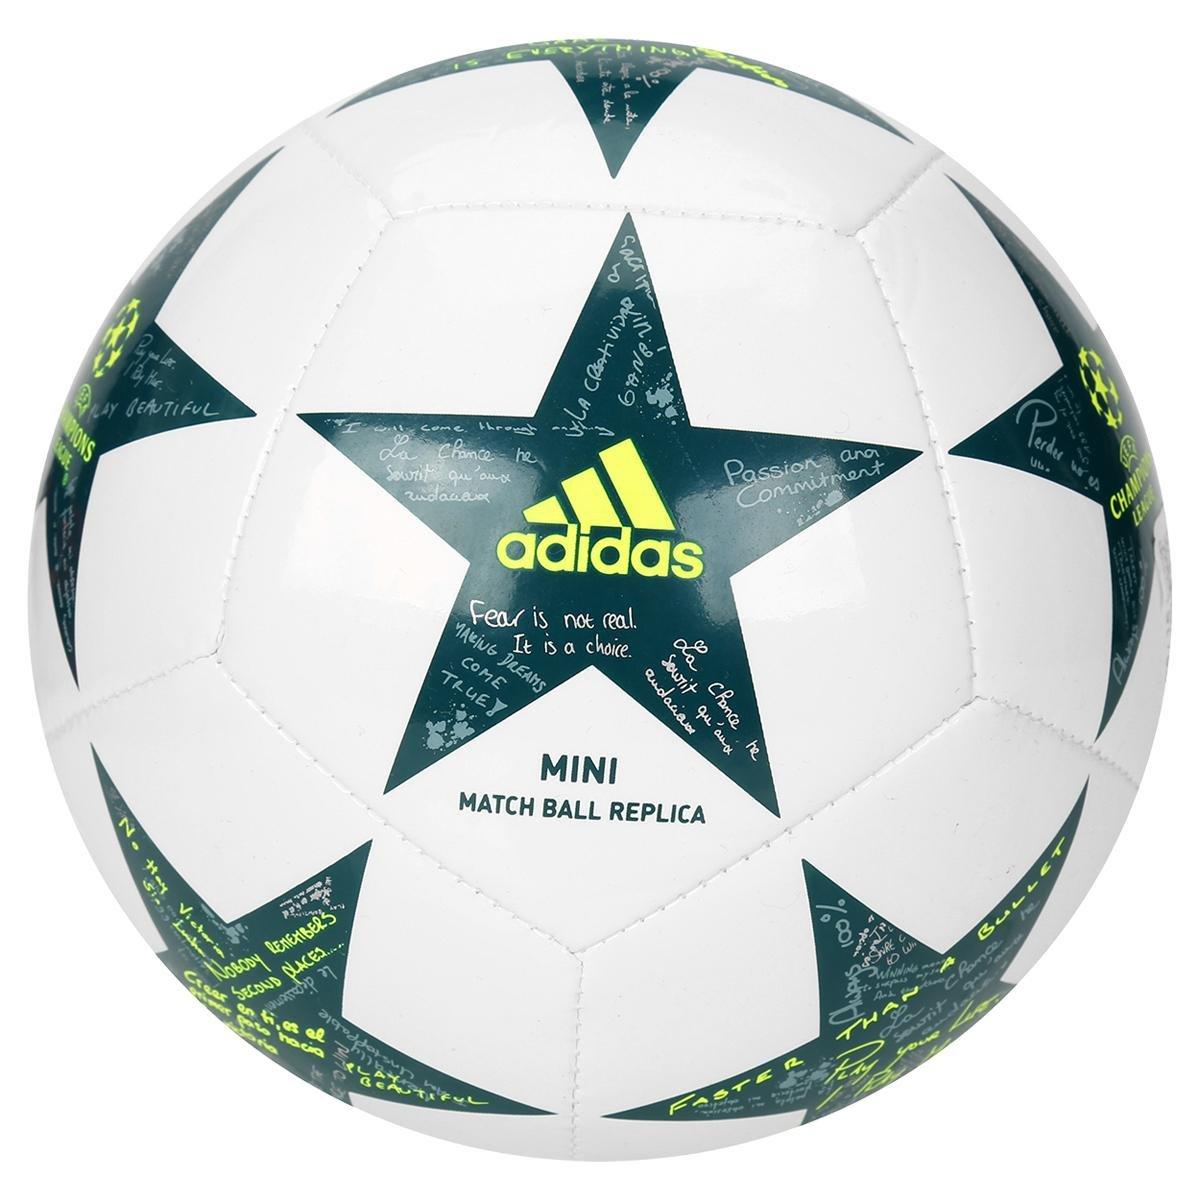 54929d02592a1 Minibola Futebol Adidas Finale 2016 - Compre Agora